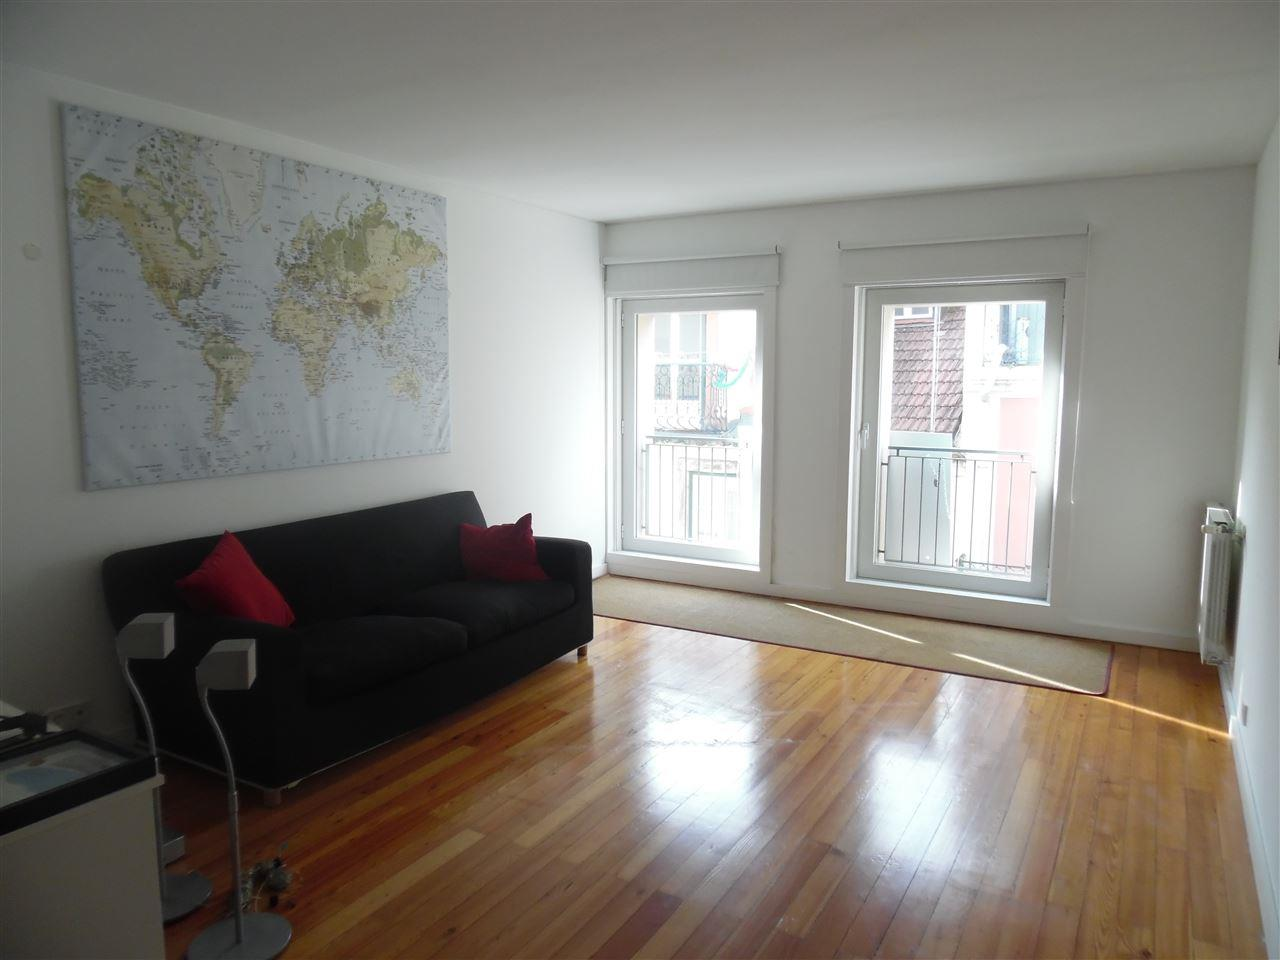 Apartment for Sale at Flat, 2 bedrooms, for Sale Lisboa, Lisboa, 1200-269 Portugal